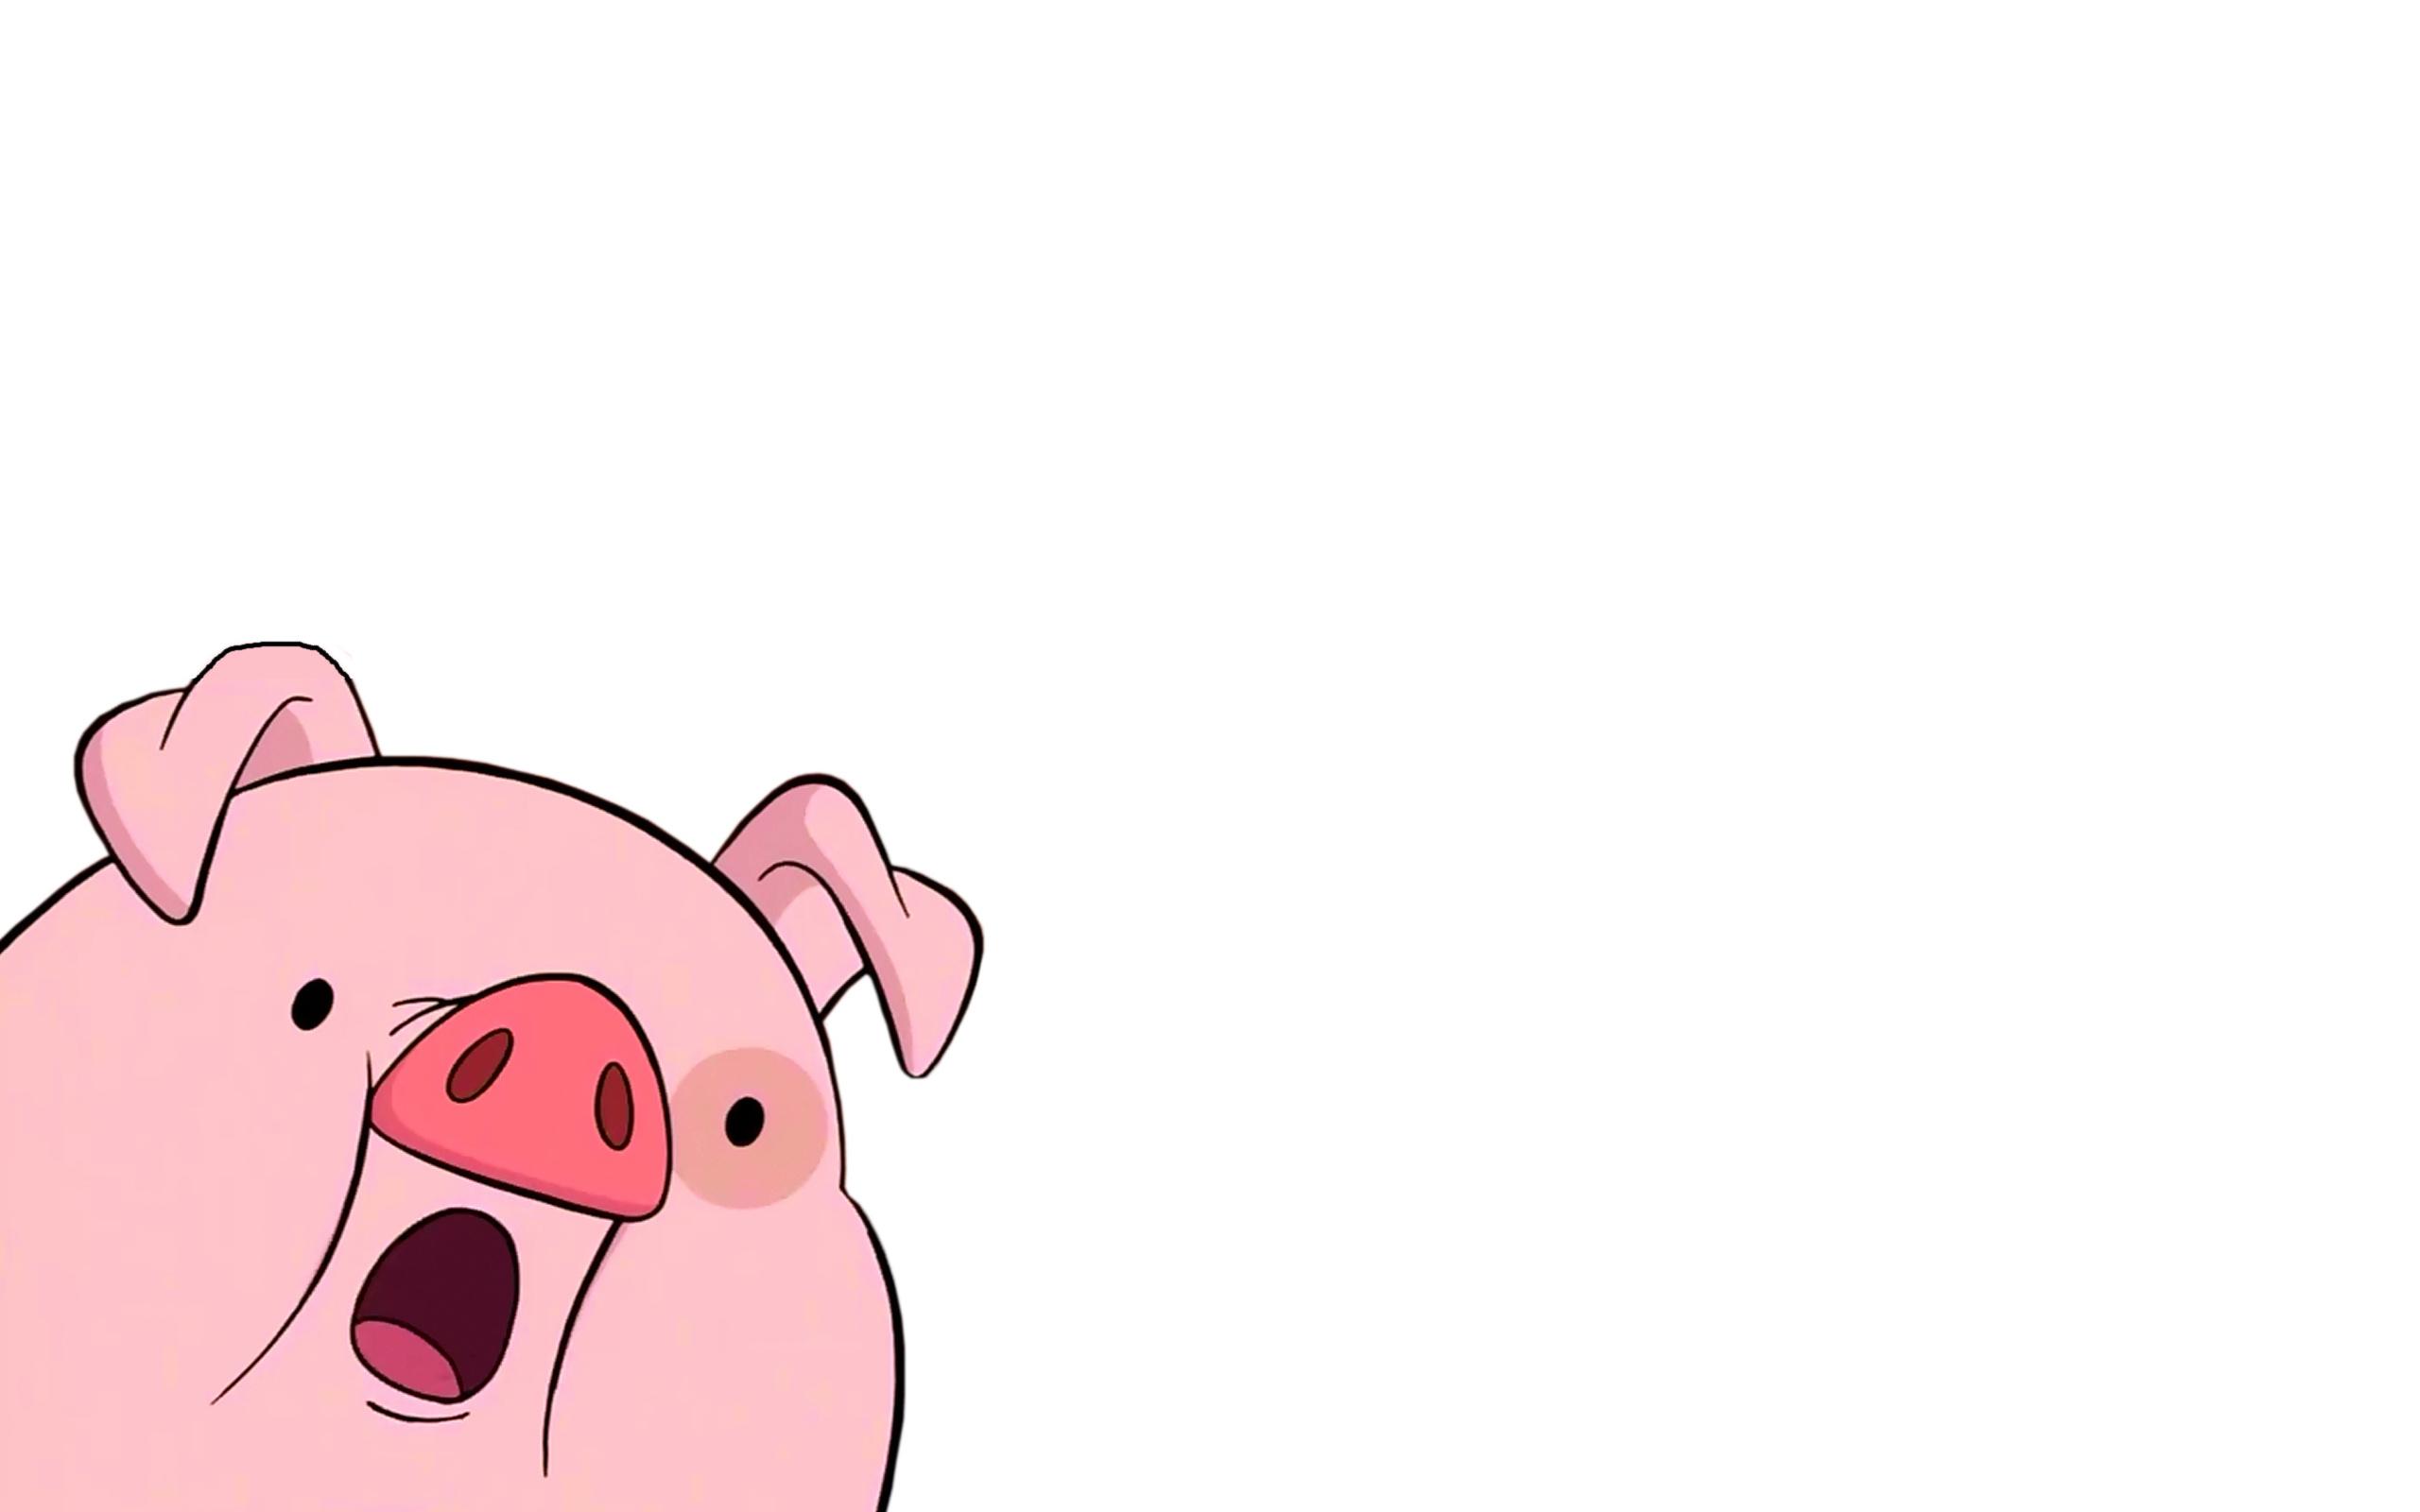 Обои Год Свиньи Во Весь Экран